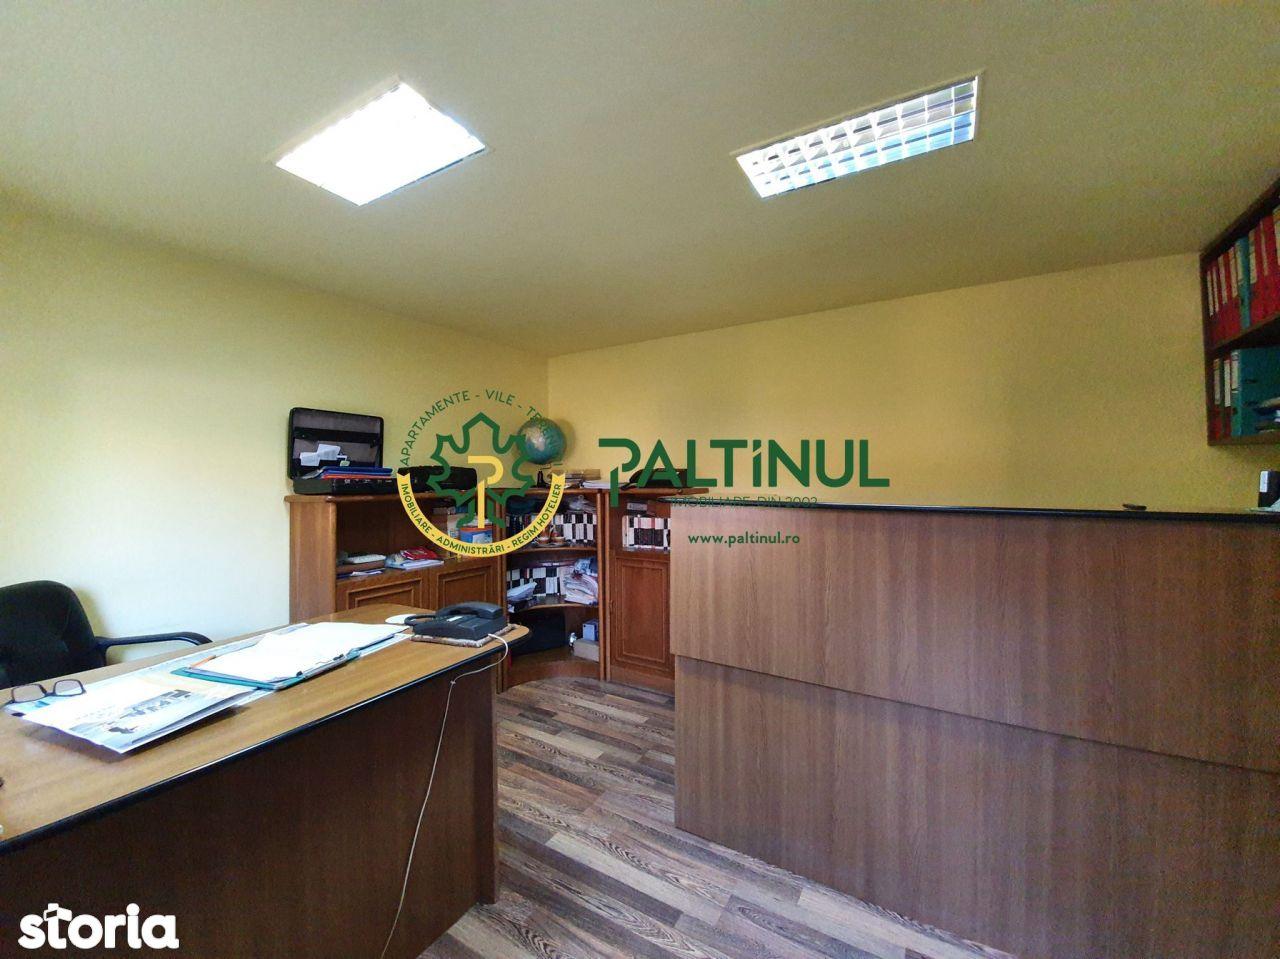 Spatiu comercial/de depozitare si birou